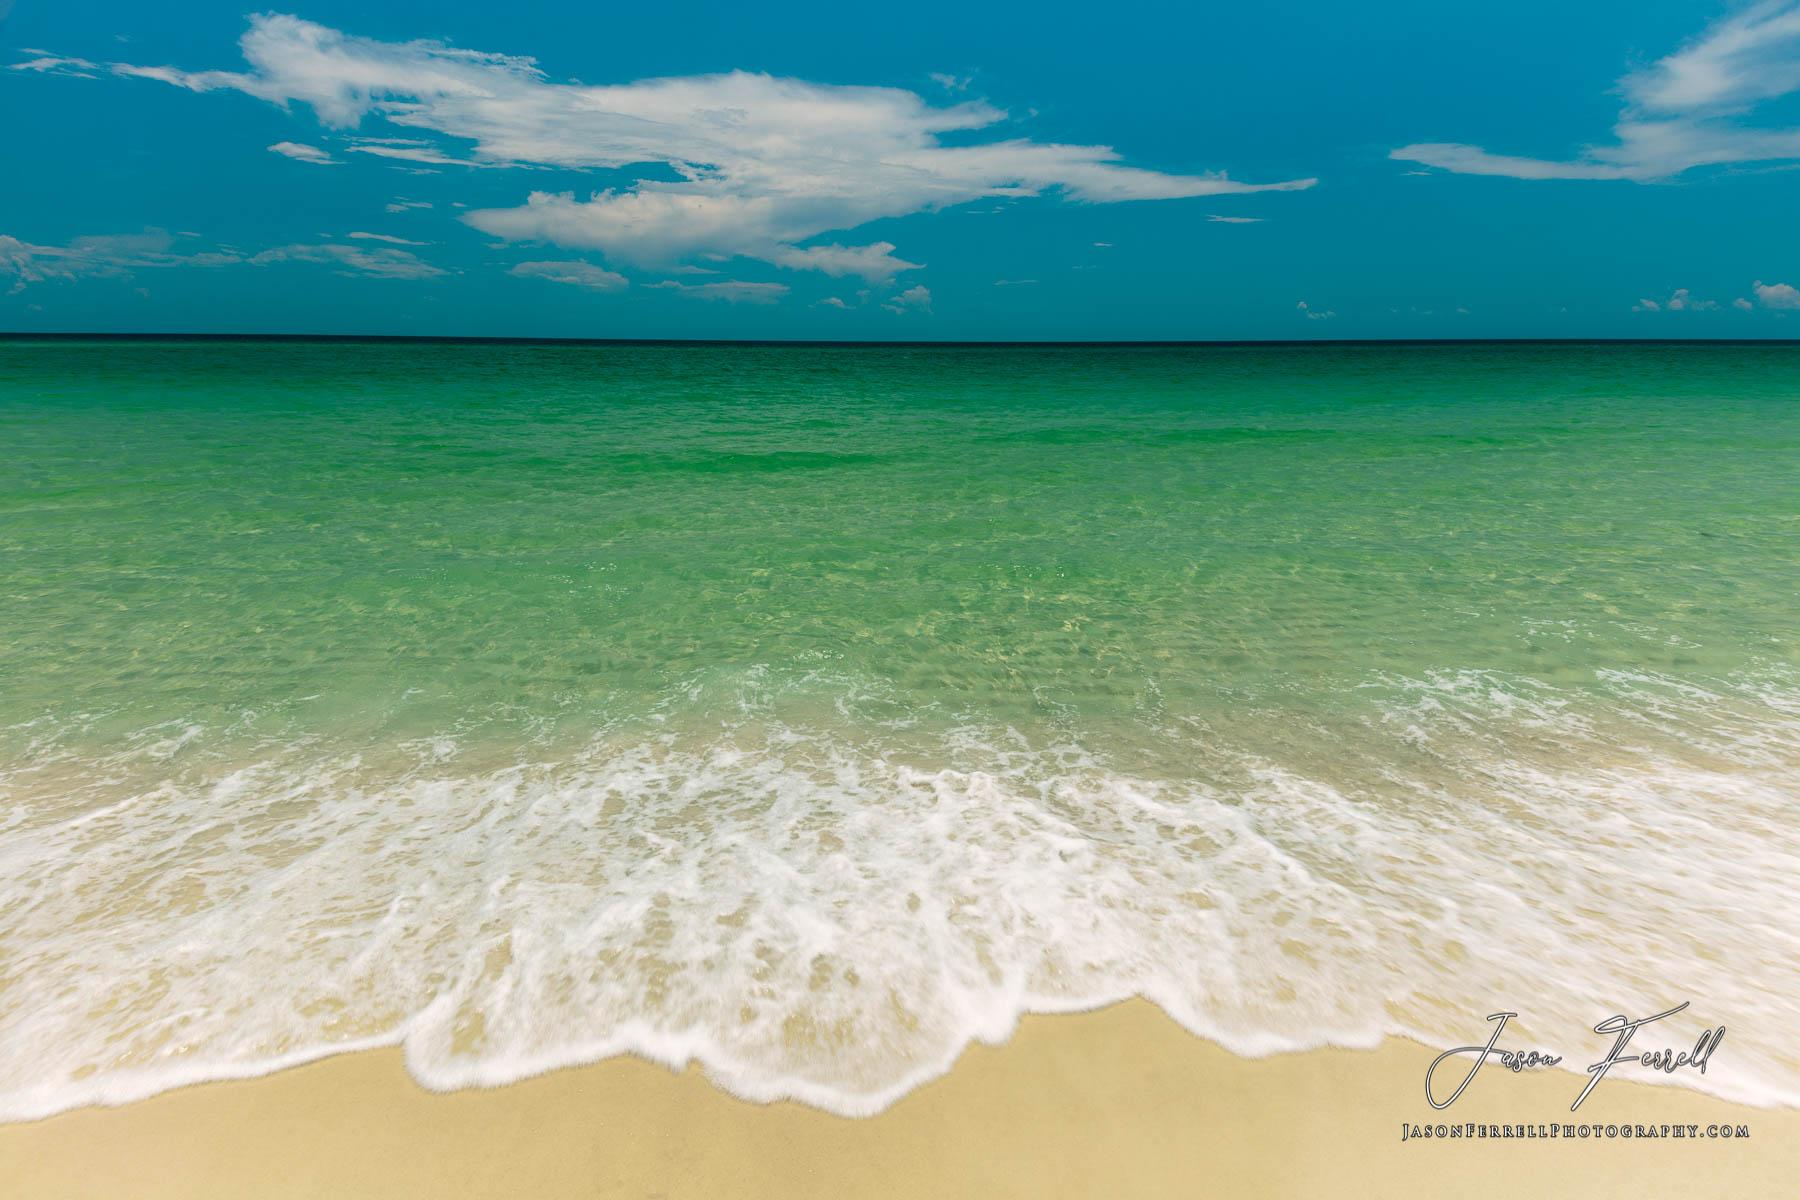 A mid summer day on the beach at Santa Rosa Island, Florida.